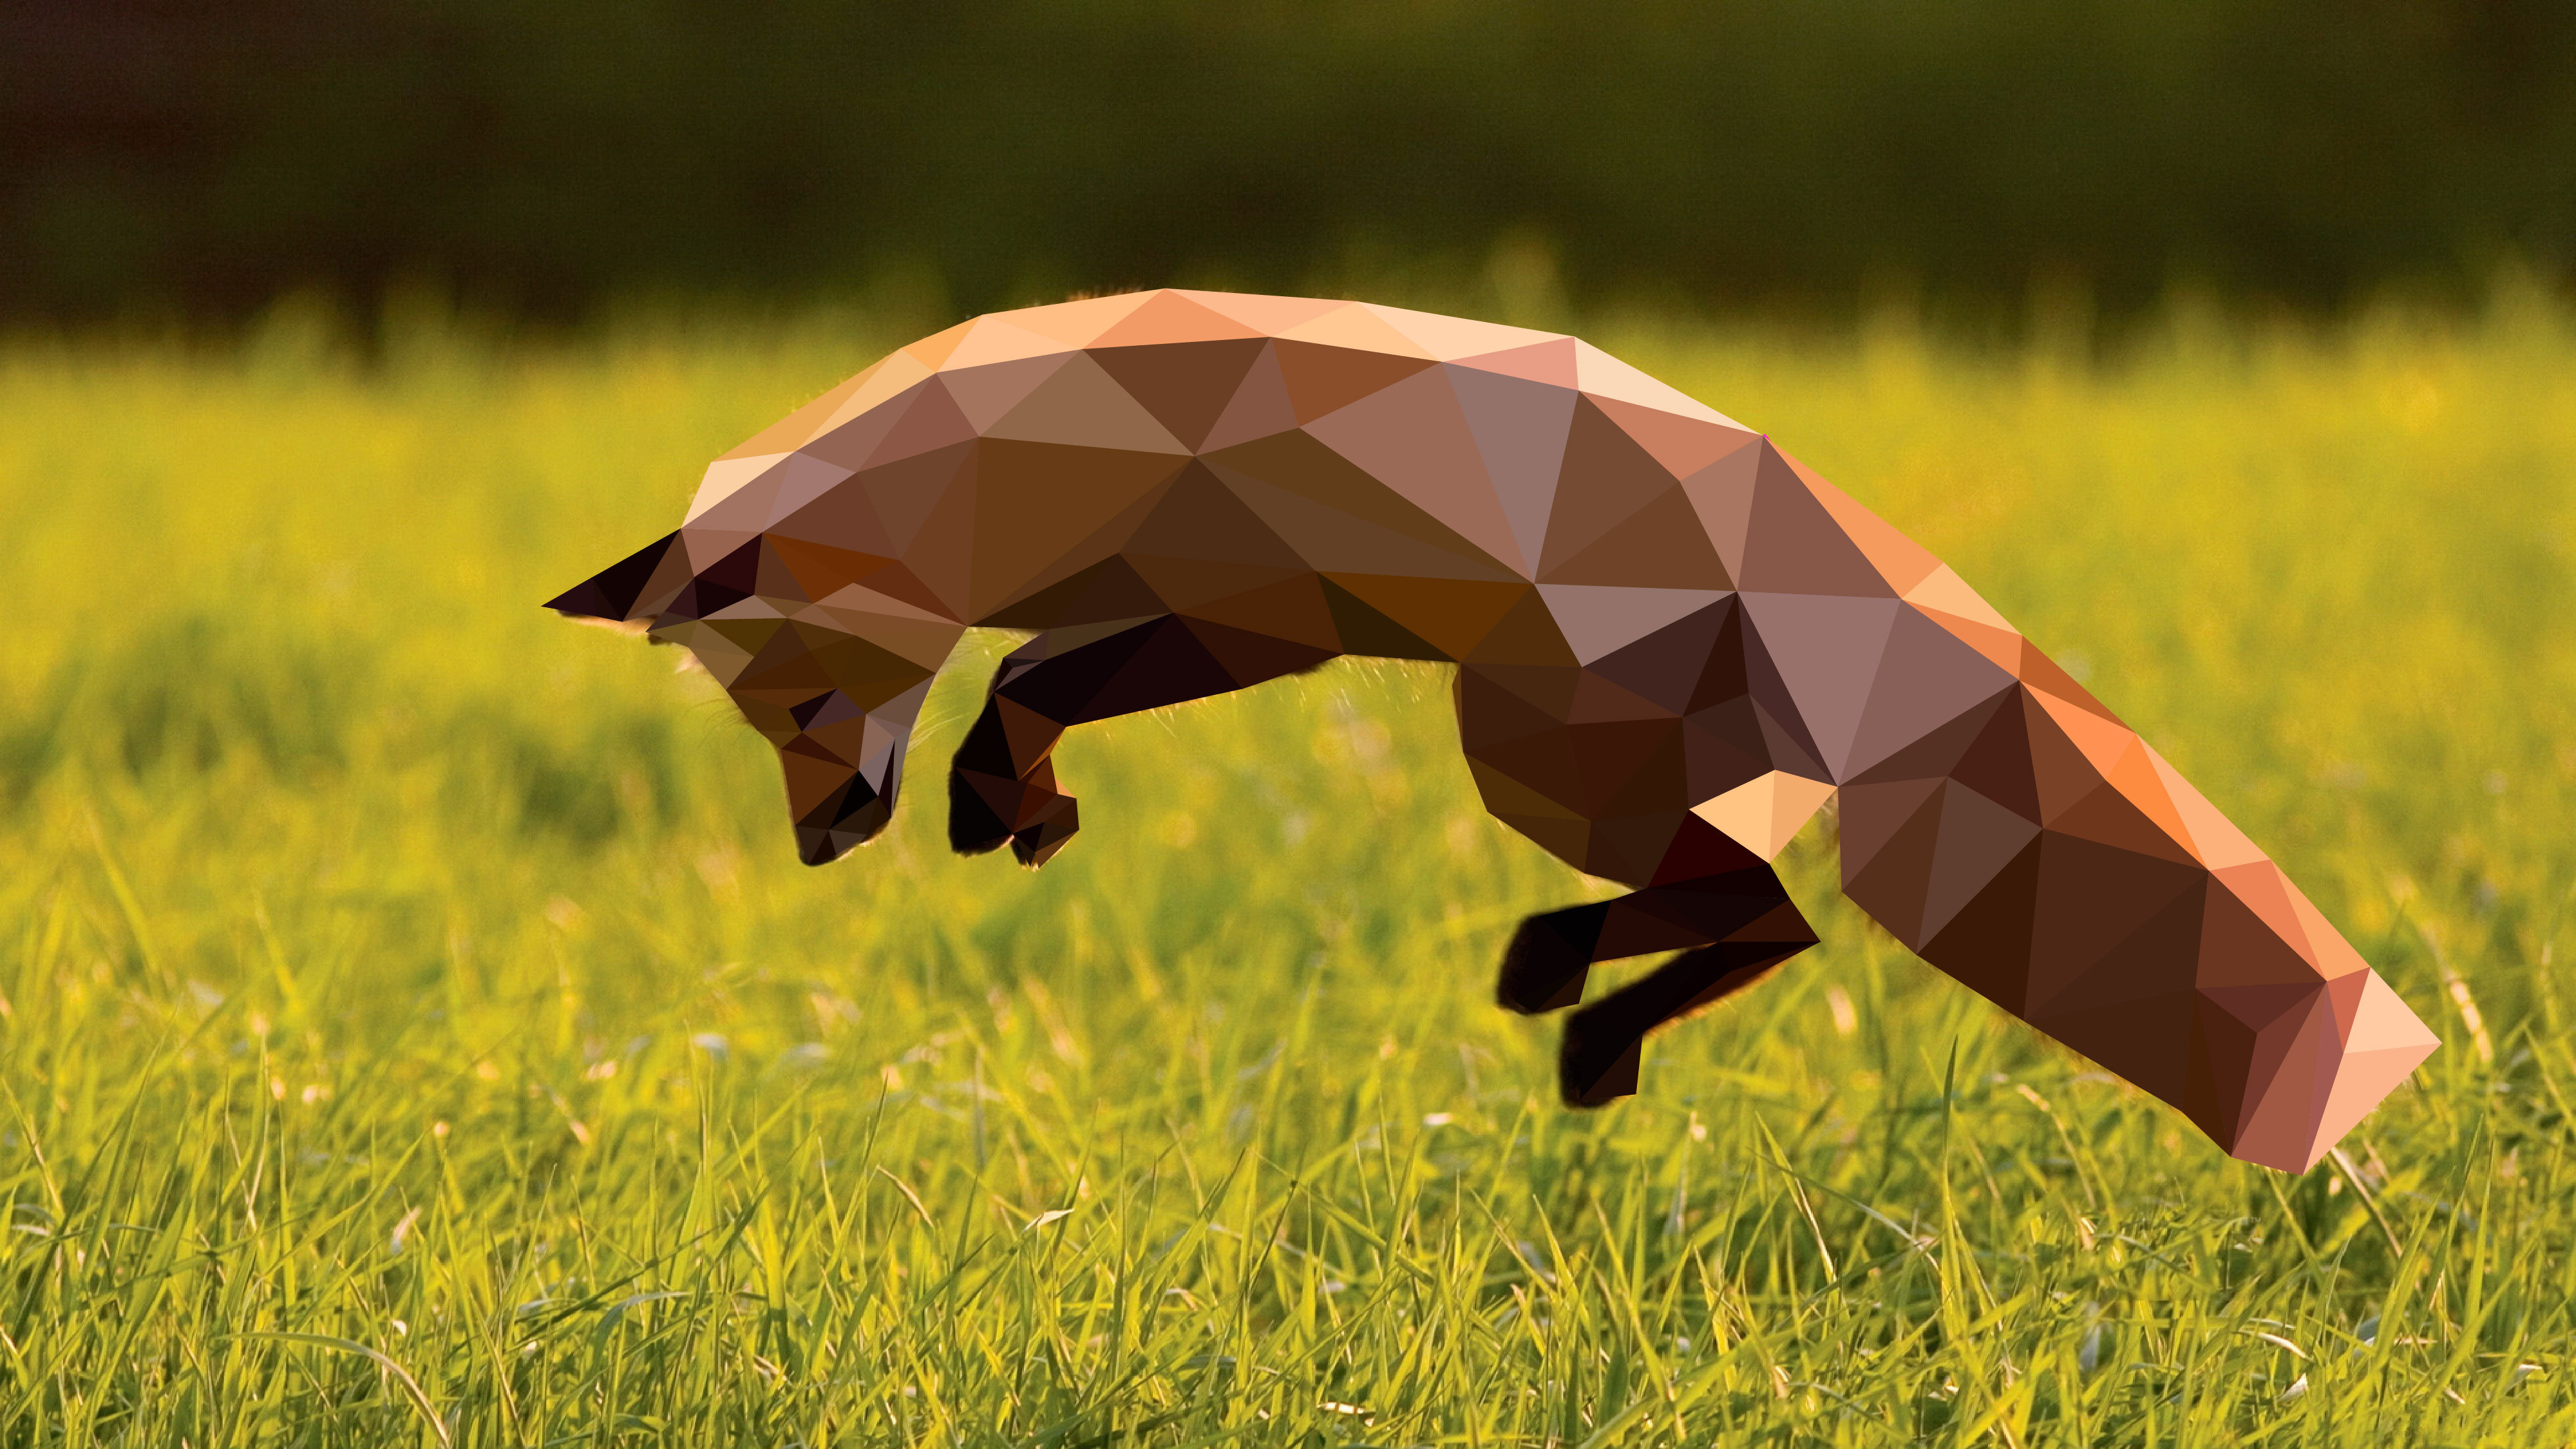 Polygon Fox Wallpaper